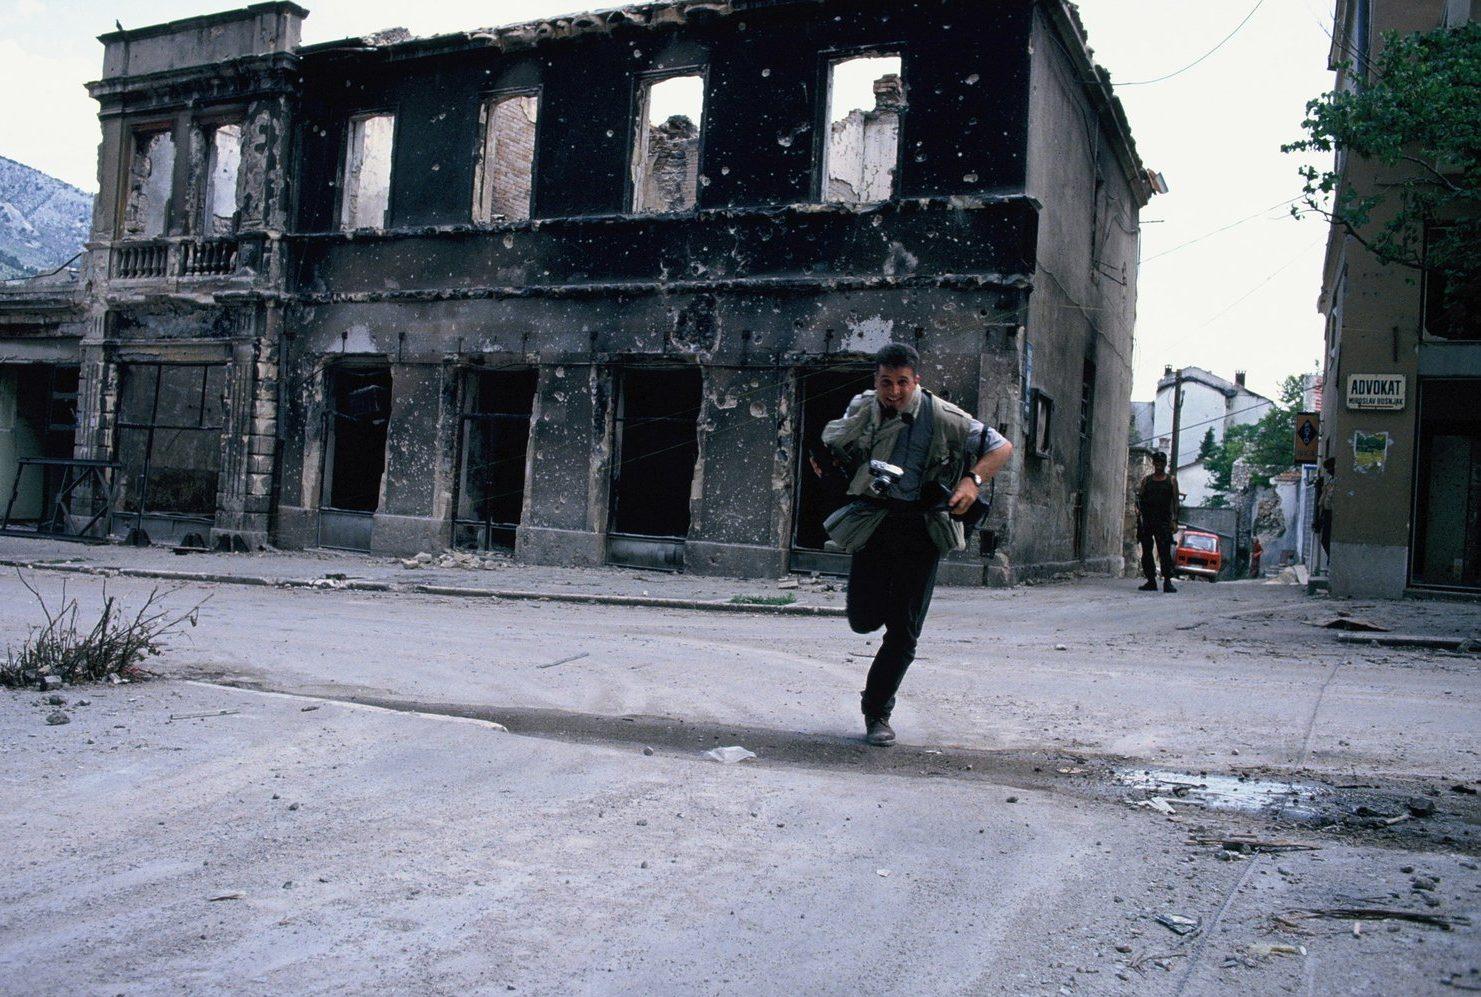 Andrew Reid, Photographer Gary Knight in Mostar, Bosnia, 1993. Photograph courtesy of Andrew Reid.